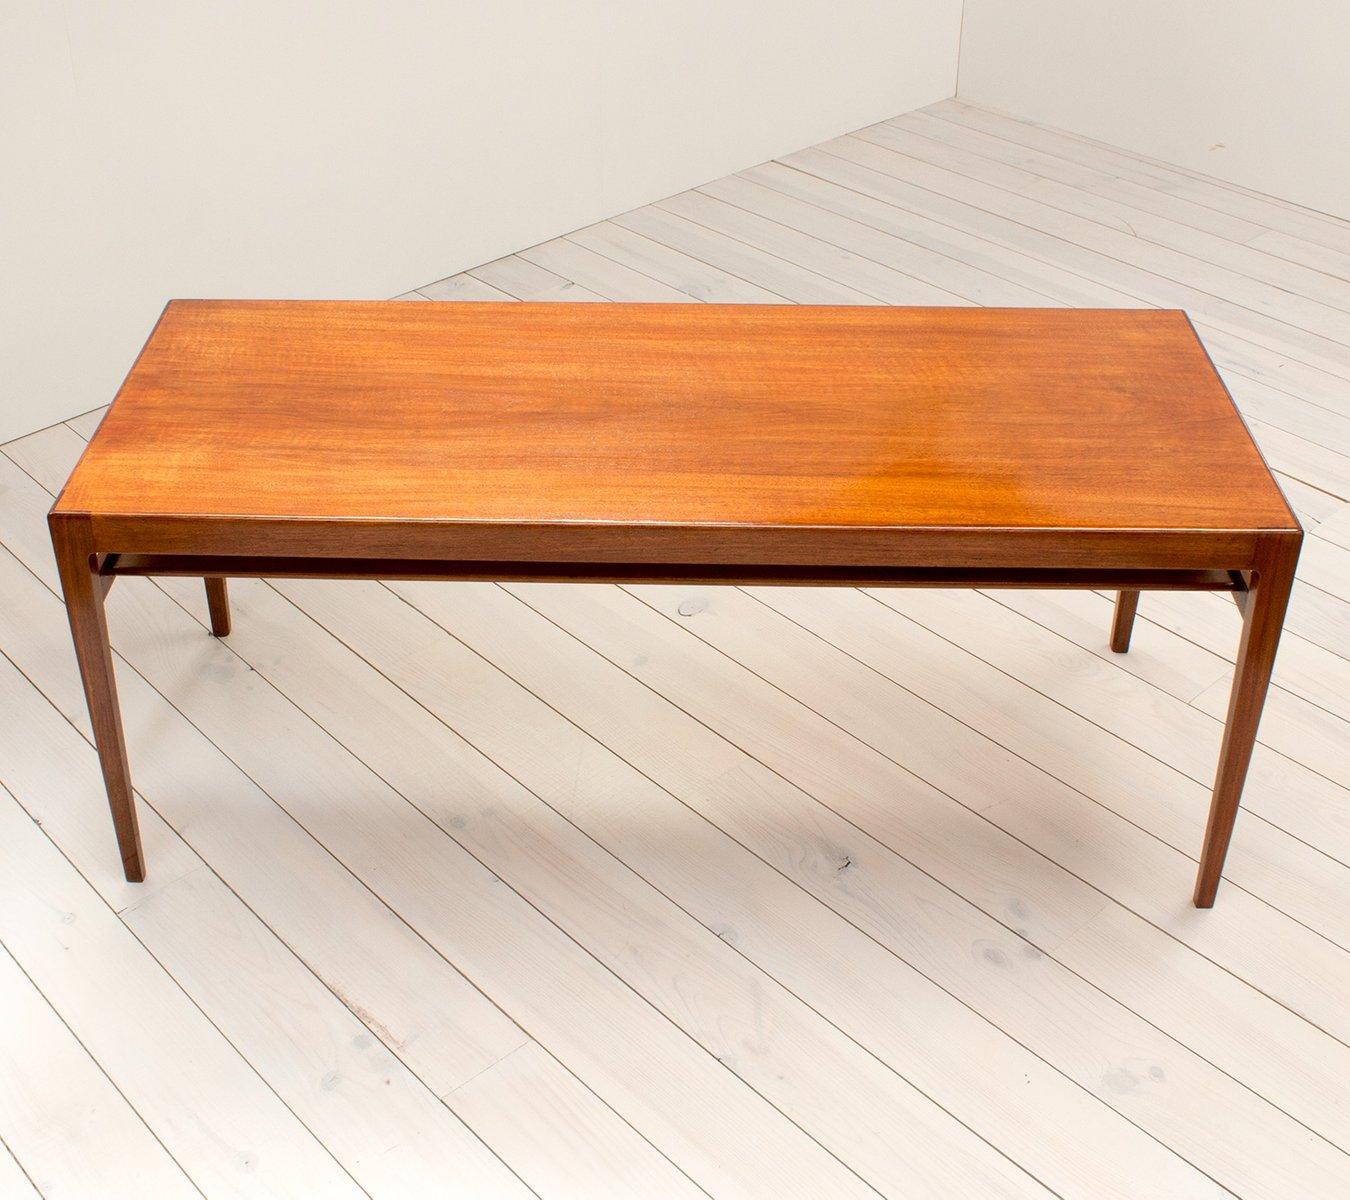 Danish Rosewood Coffee Table From Ludvig Pontoppidan, 1960s